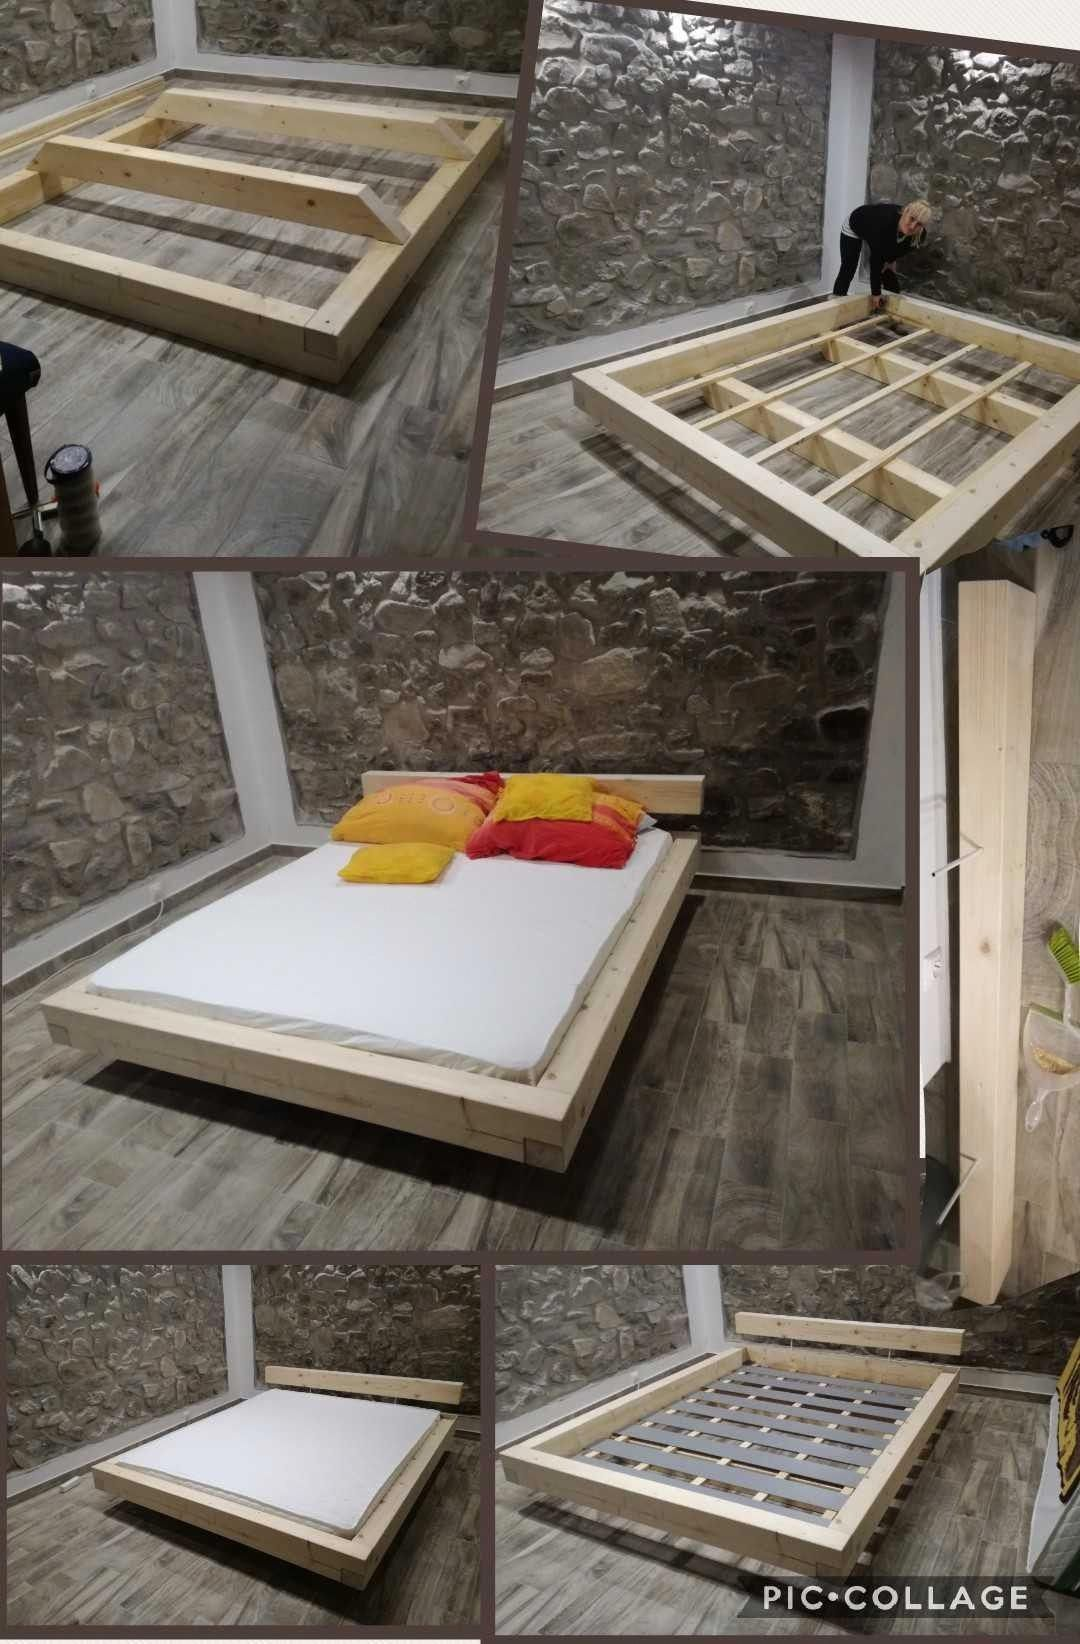 Bed Frames 26 Incredible Bed Frames No Box Spring Wooden Bed